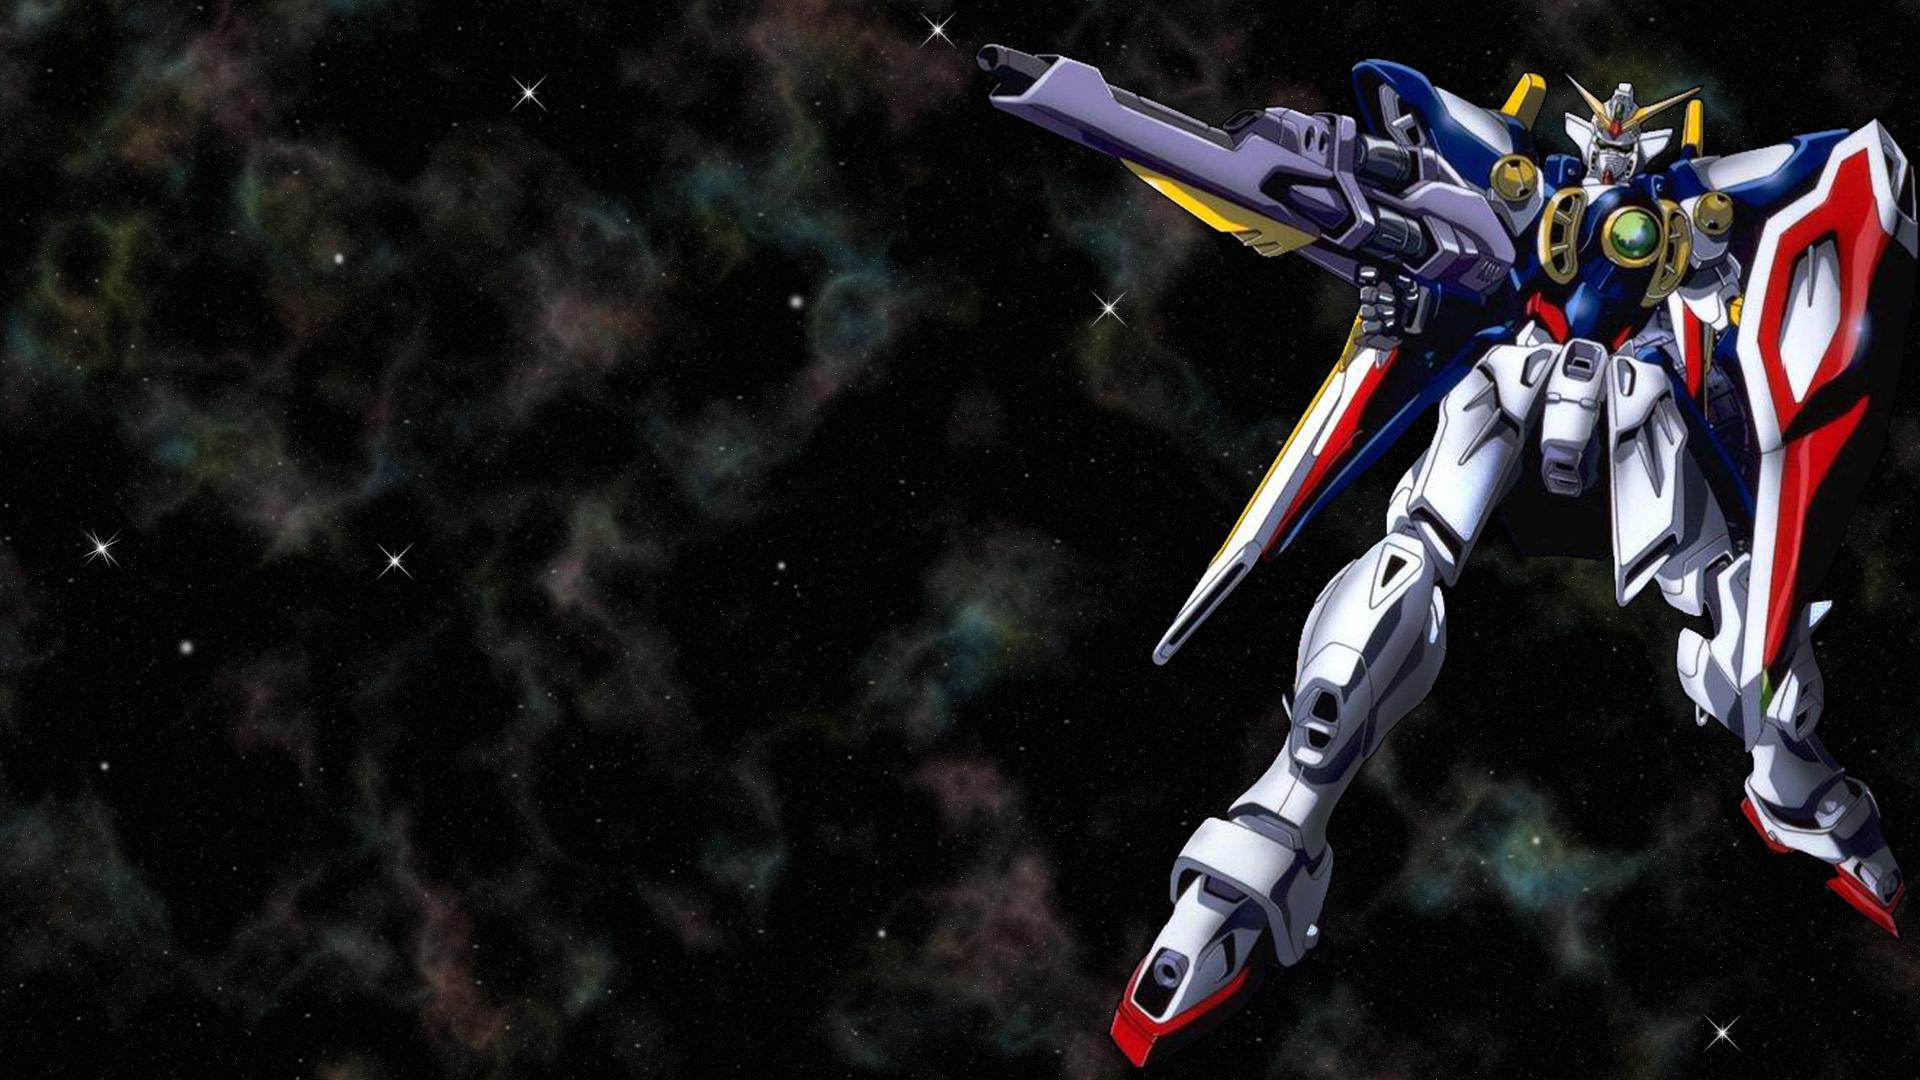 42 gundam wallpaper 1080p on wallpapersafari - Gundam wallpaper hd ...